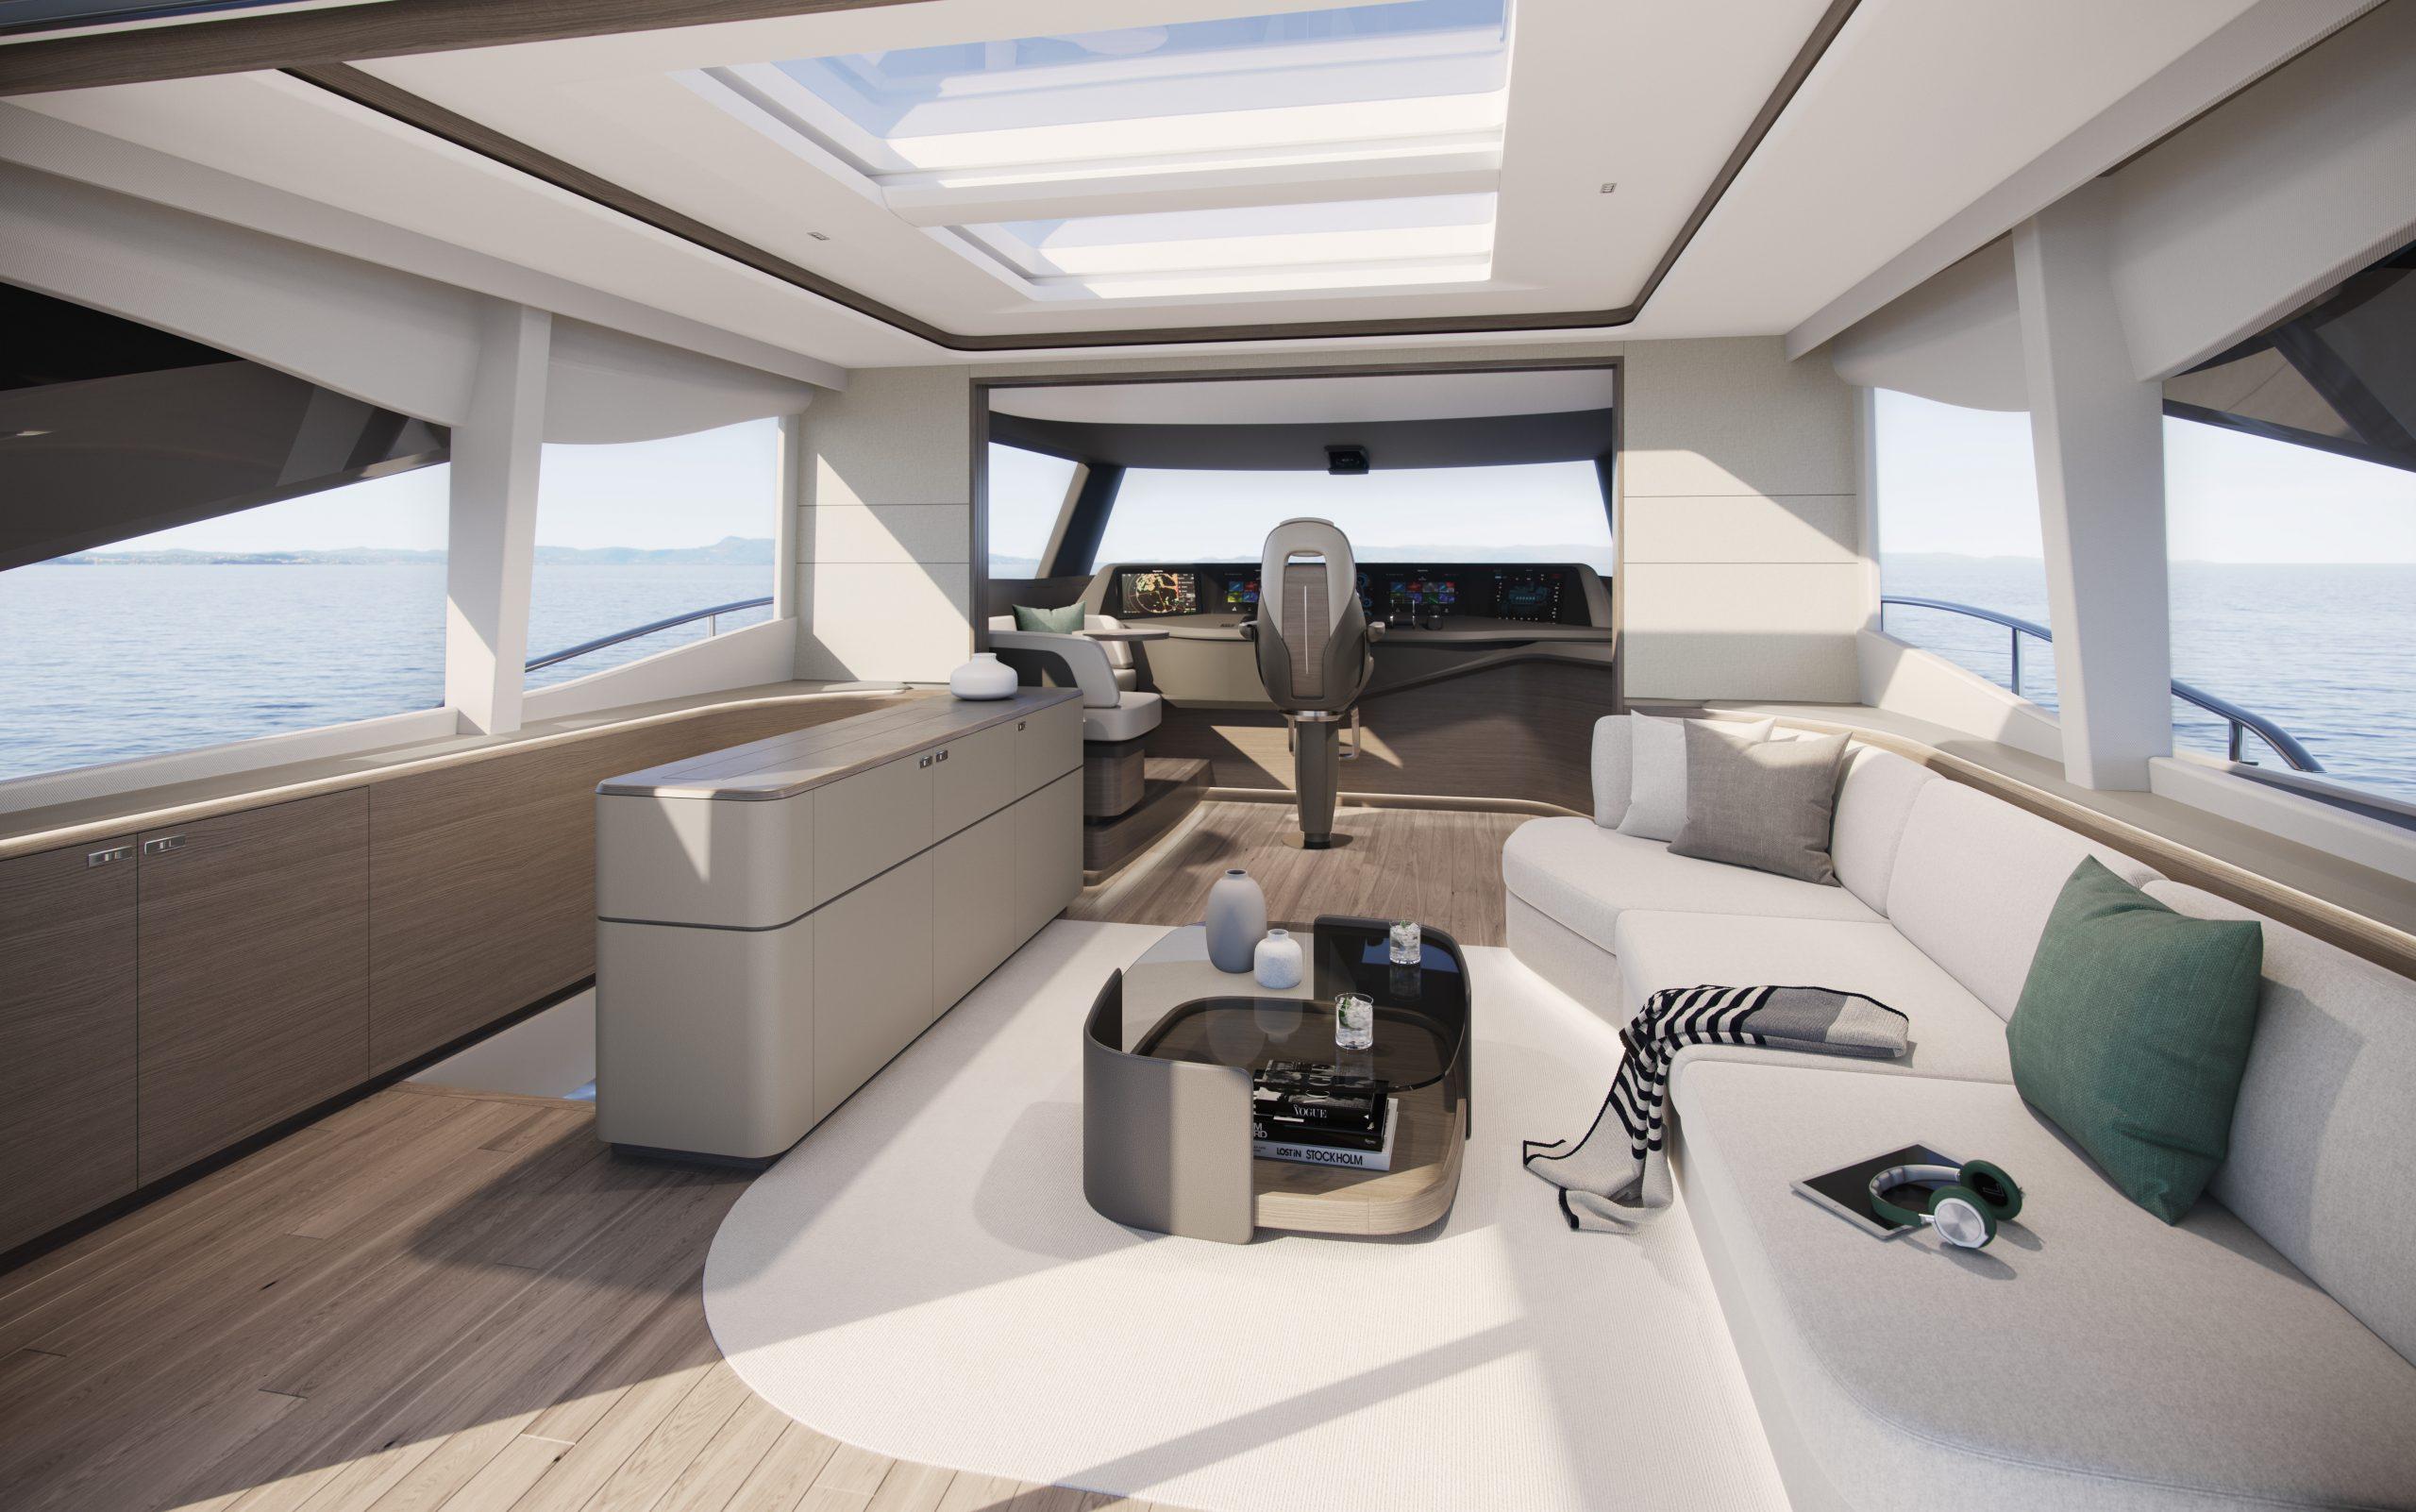 x80 interior skylounge cgi scaled 1